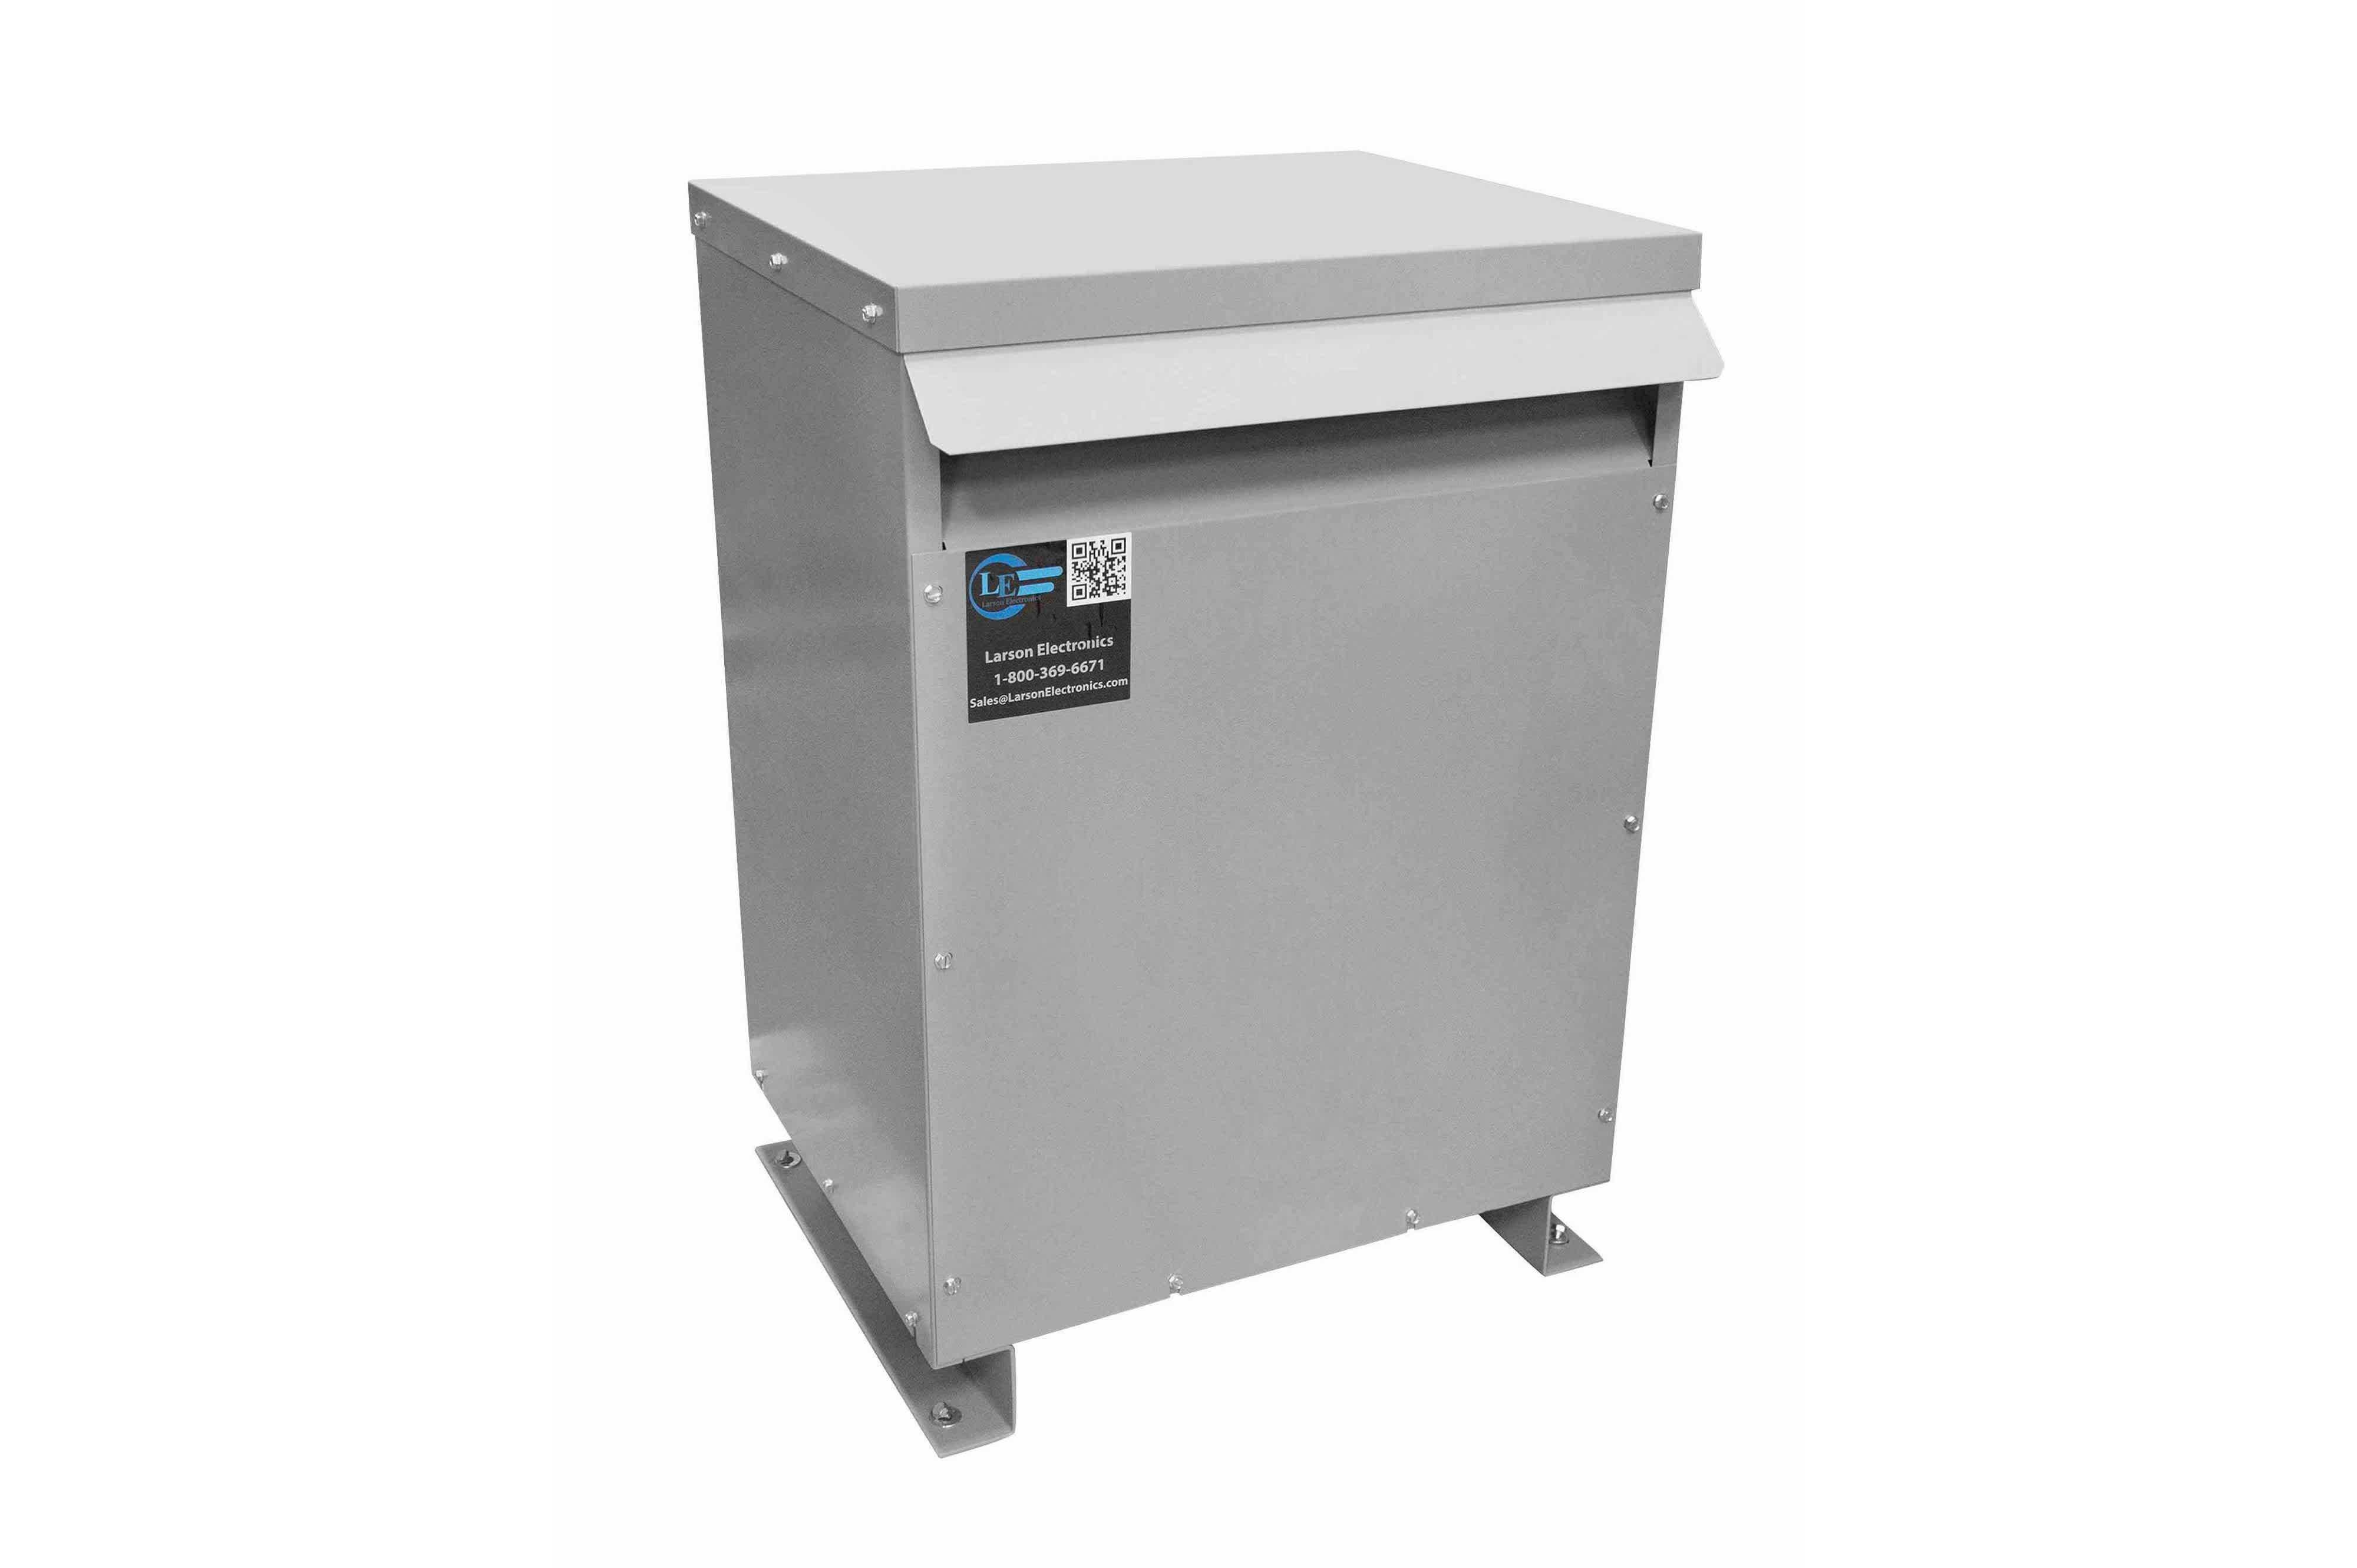 42.5 kVA 3PH Isolation Transformer, 575V Wye Primary, 240V Delta Secondary, N3R, Ventilated, 60 Hz